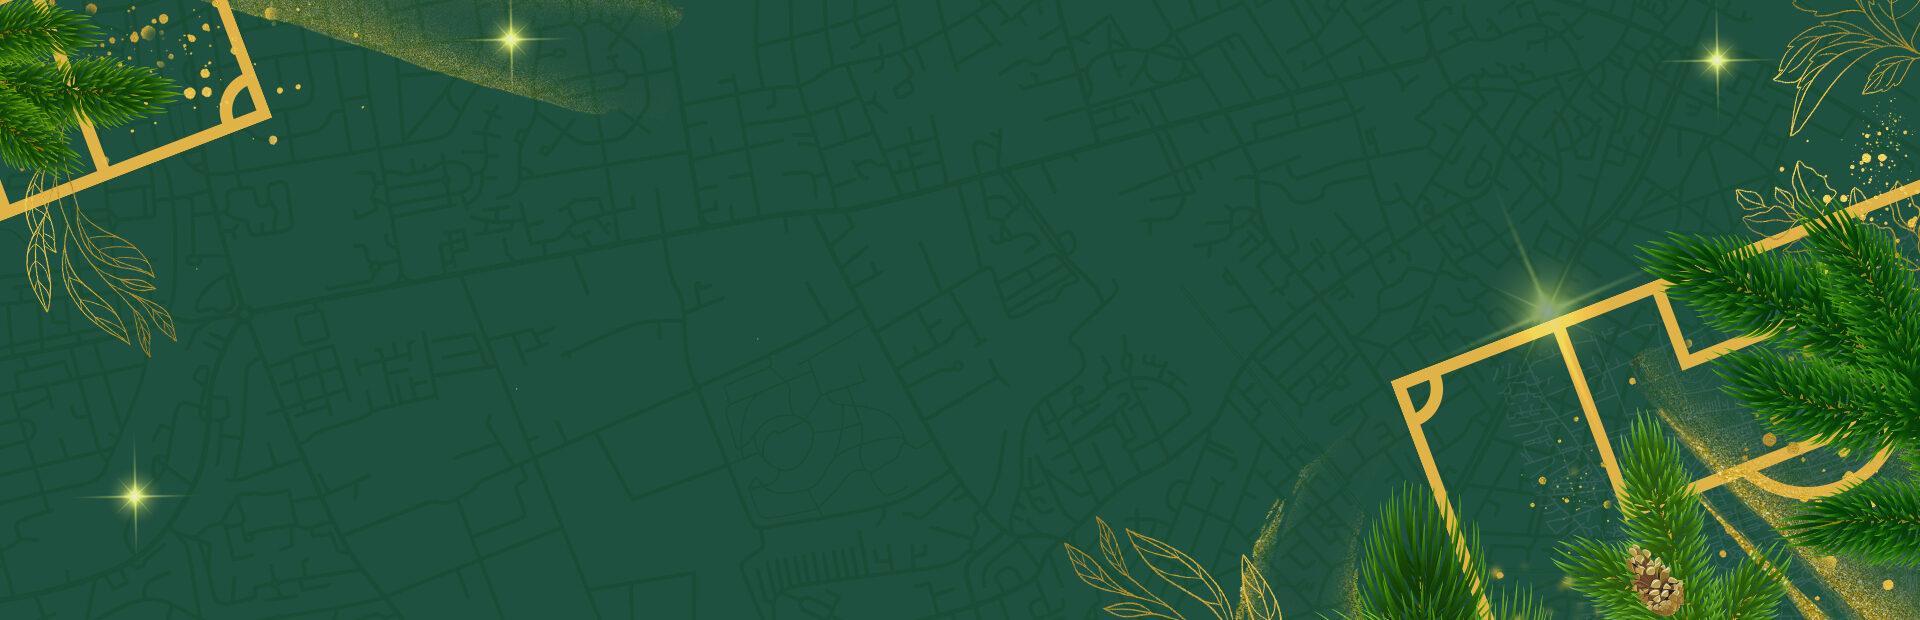 ARK2208 Hibernian Christmas Blank Web banner